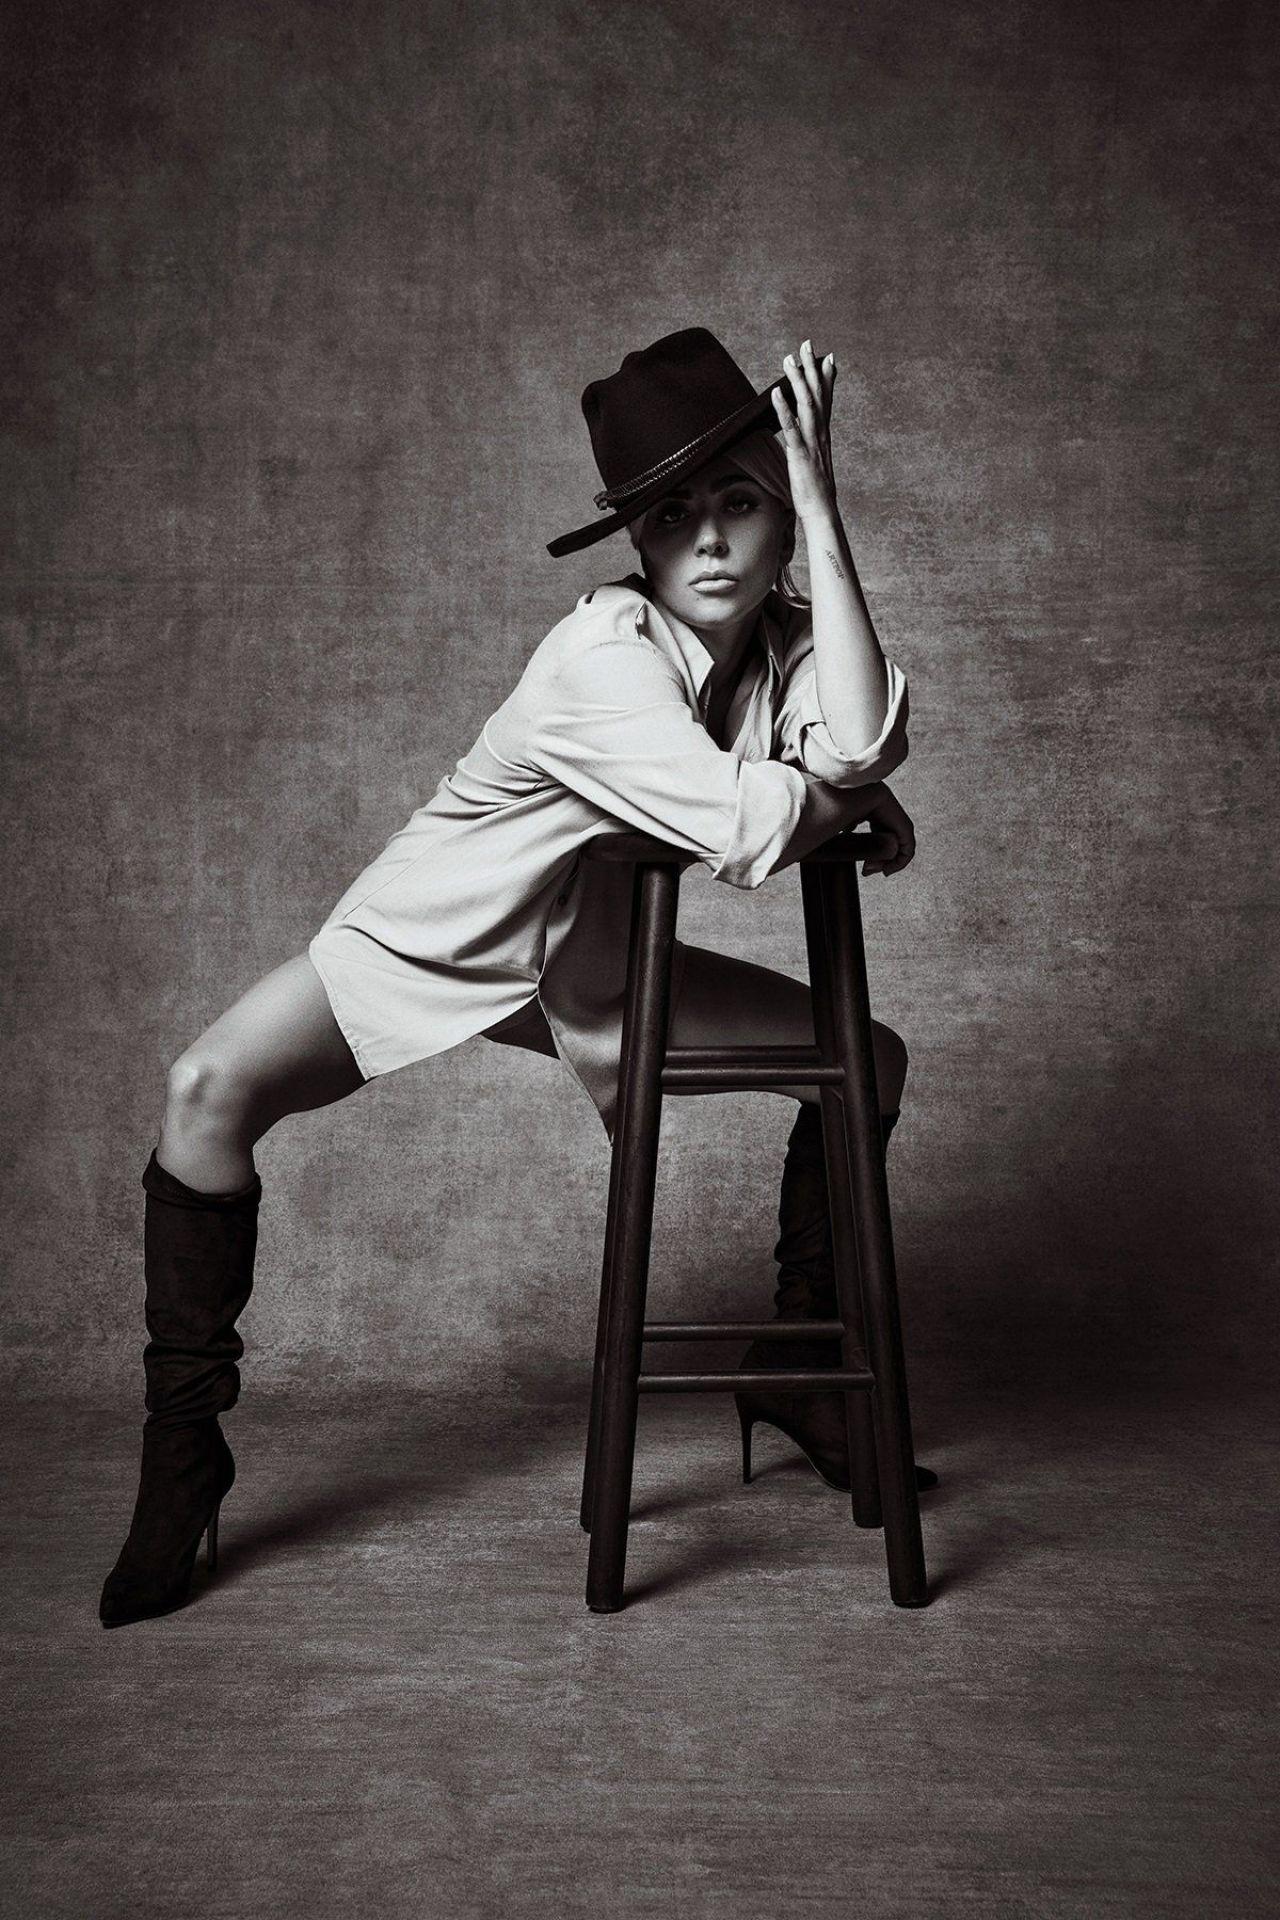 https://celebmafia.com/wp-content/uploads/2018/11/lady-gaga-variety-magazine-november-2018-0.jpg